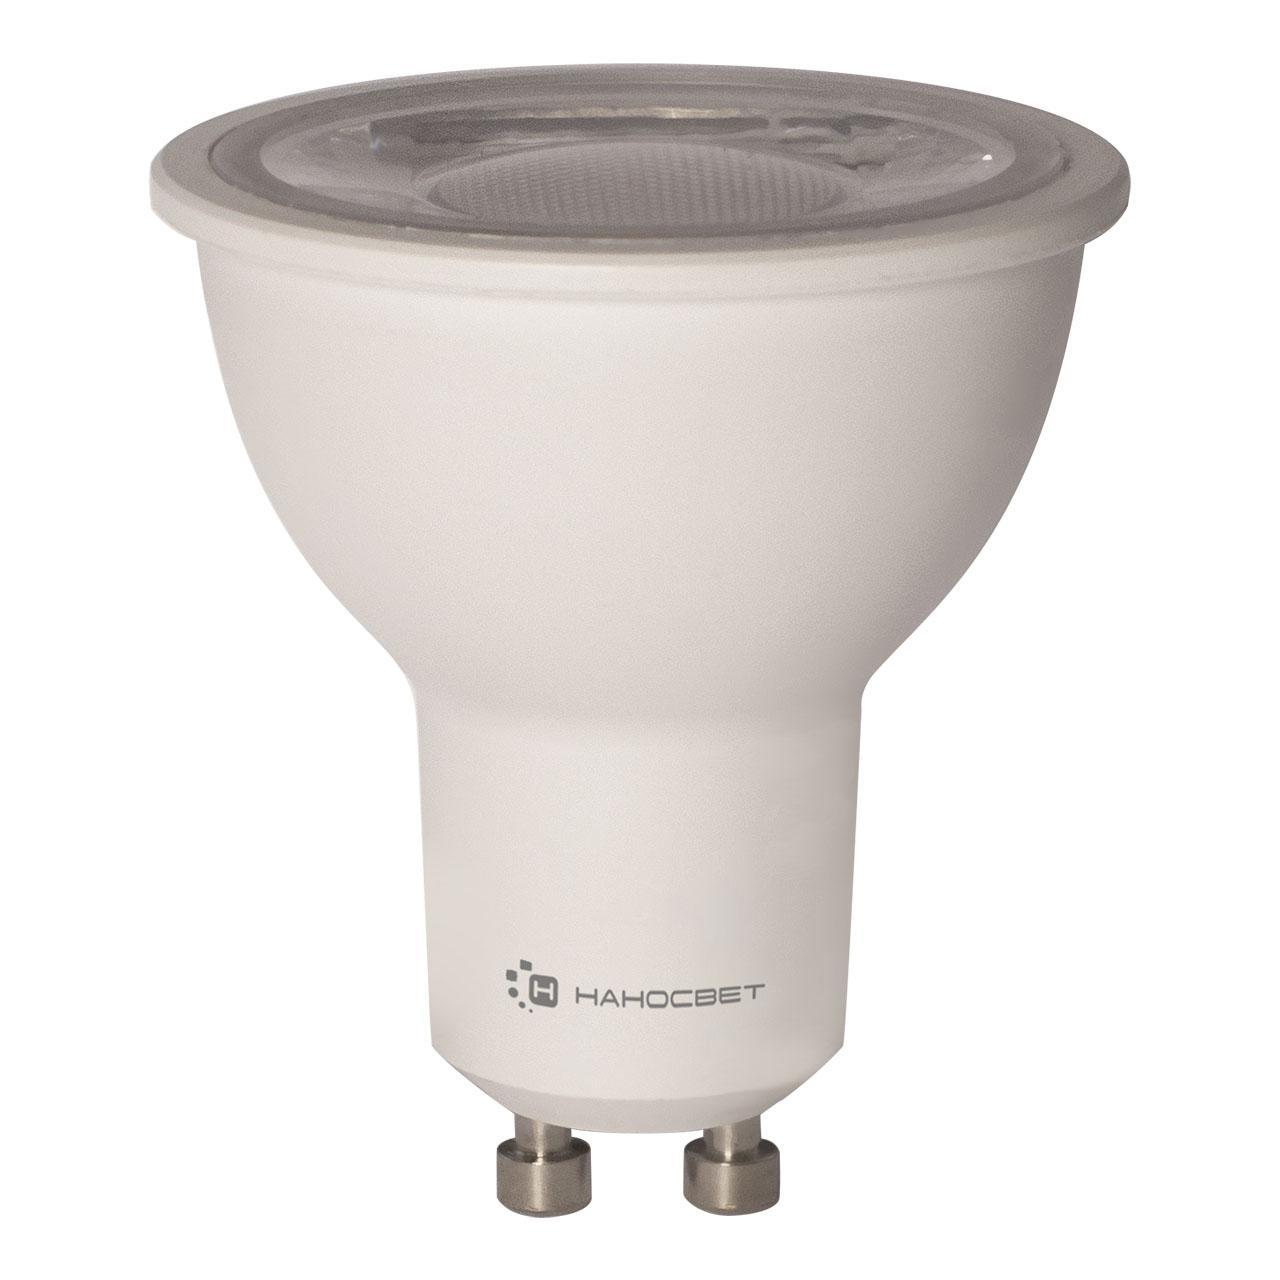 Лампа светодиодная GU10 8,5W 4000K прозрачная LH-MR16-8.5/GU10/840/38D L287 лента светодиодная полусфера наносвет l286 gu10 8 5w 2700k lh mr16 8 5 gu10 827 38d